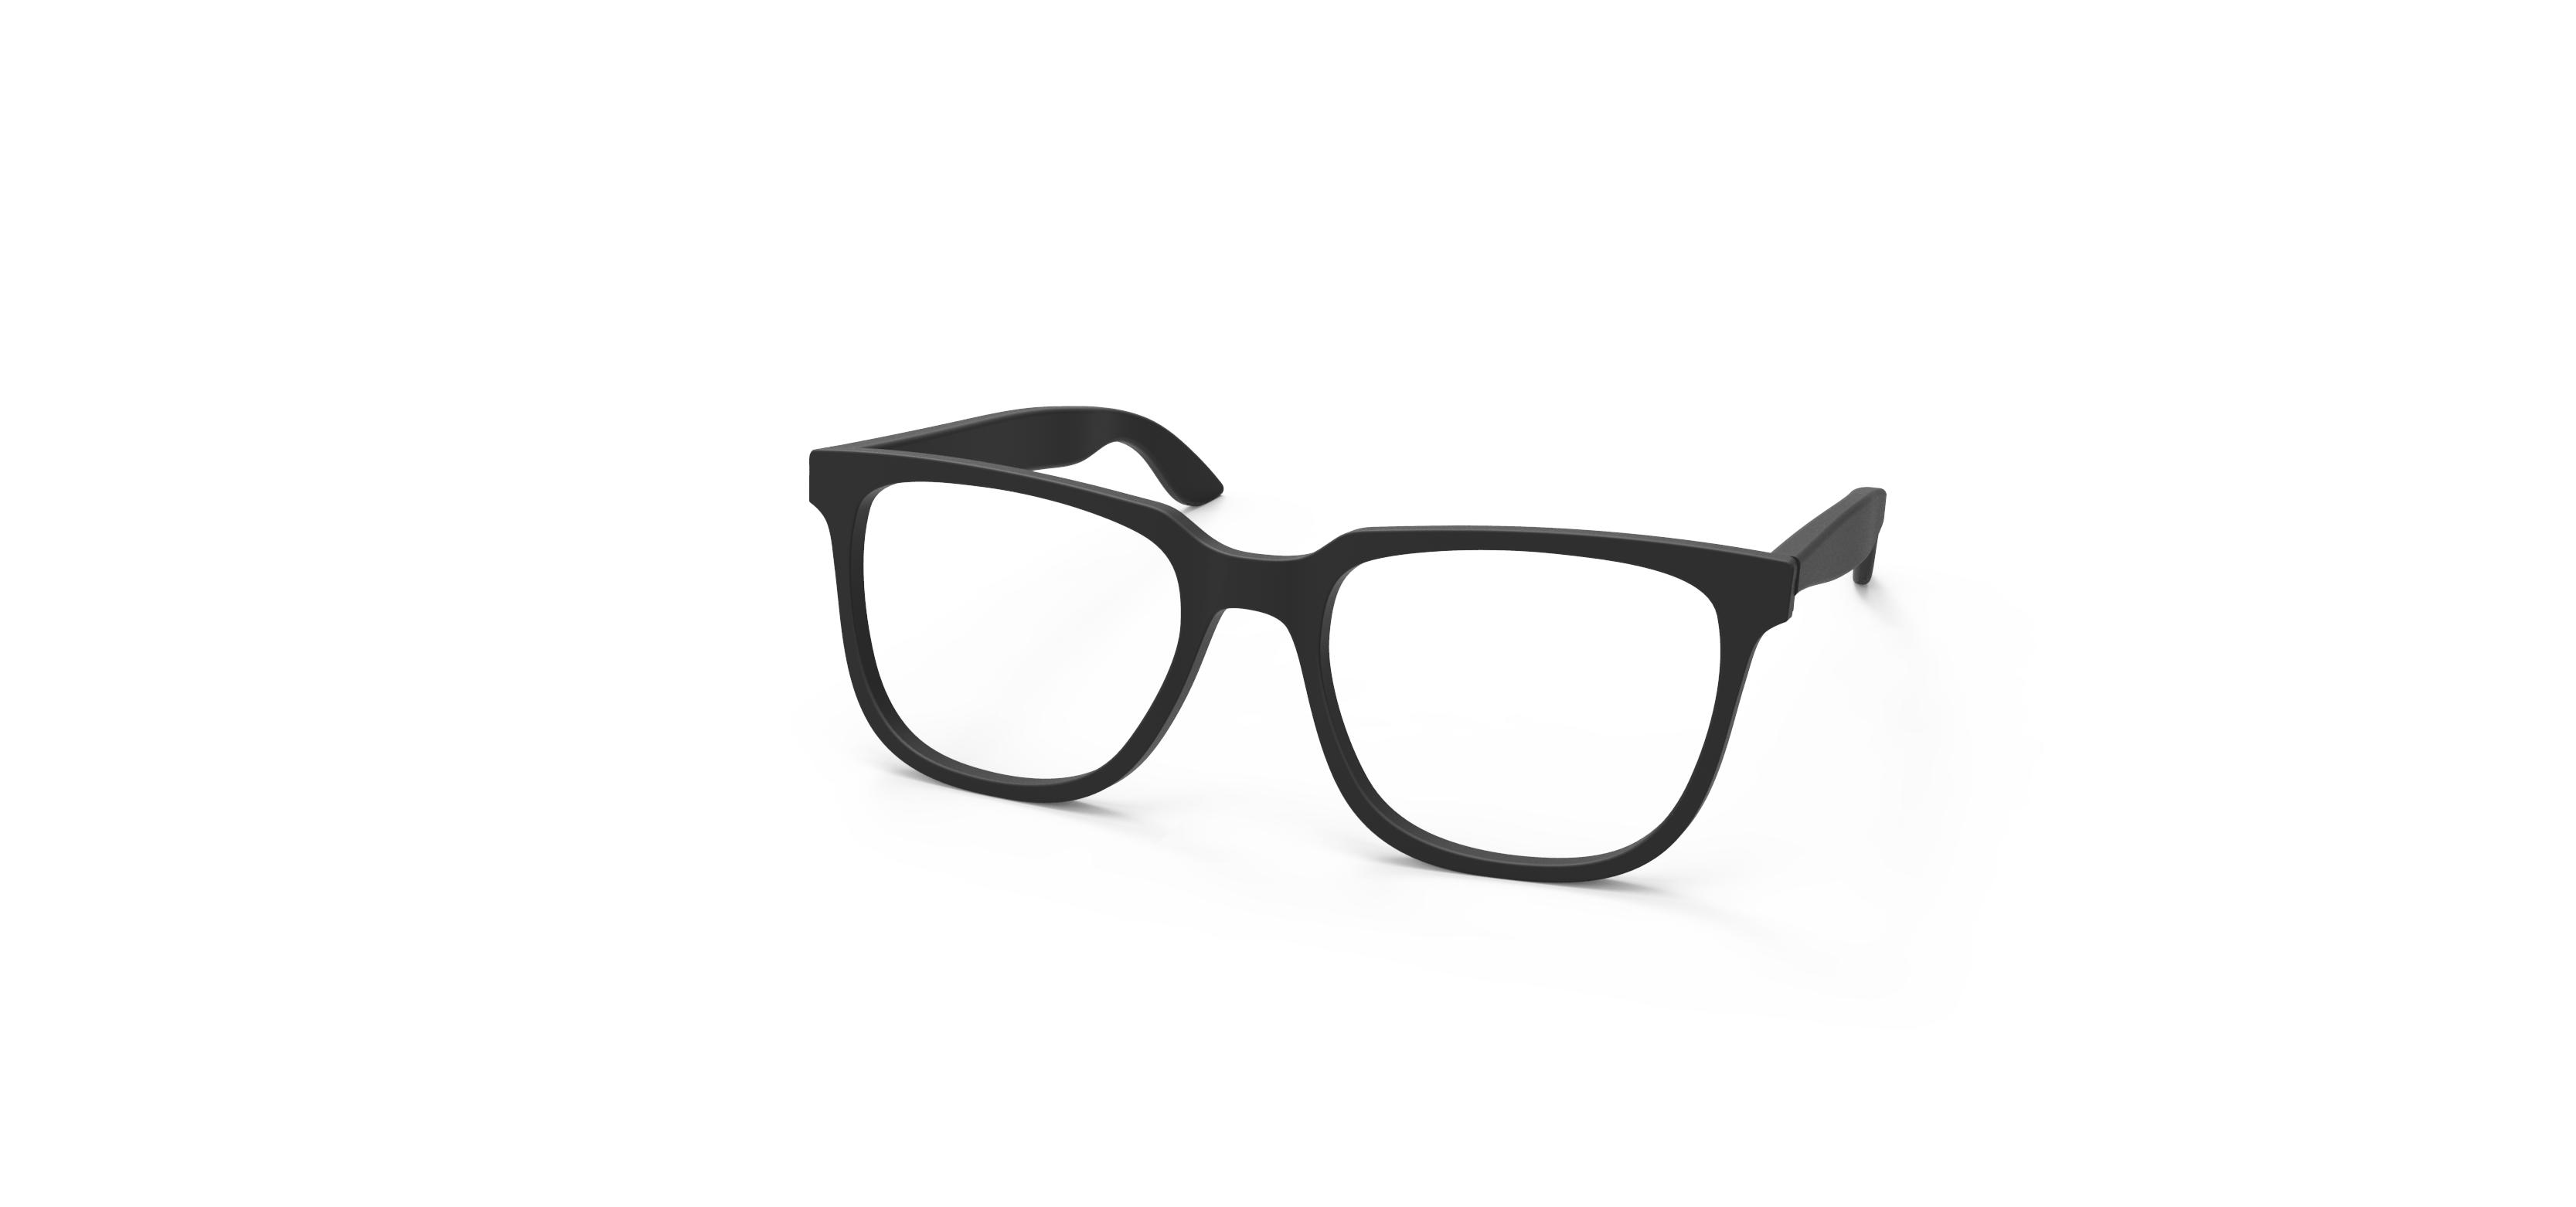 3D Printed Clark Kent Glasses Frames by casualkoru | Pinshape